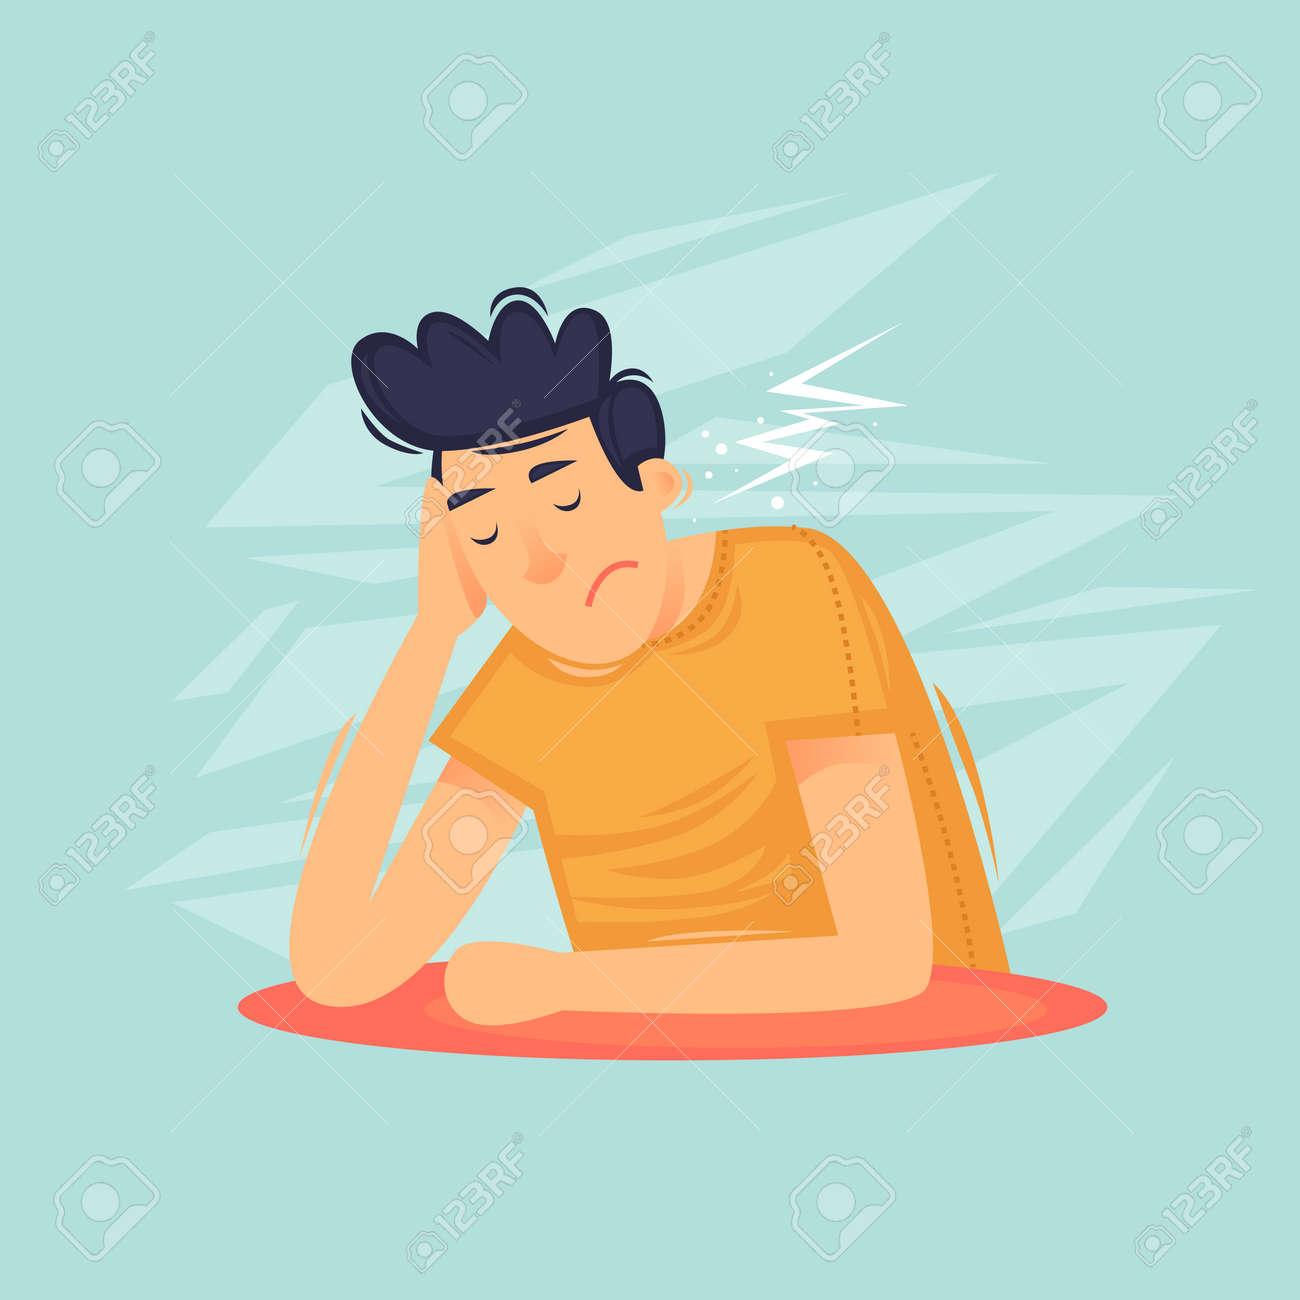 Guy is sad, depressed, tears. Flat design vector illustration - 112582474